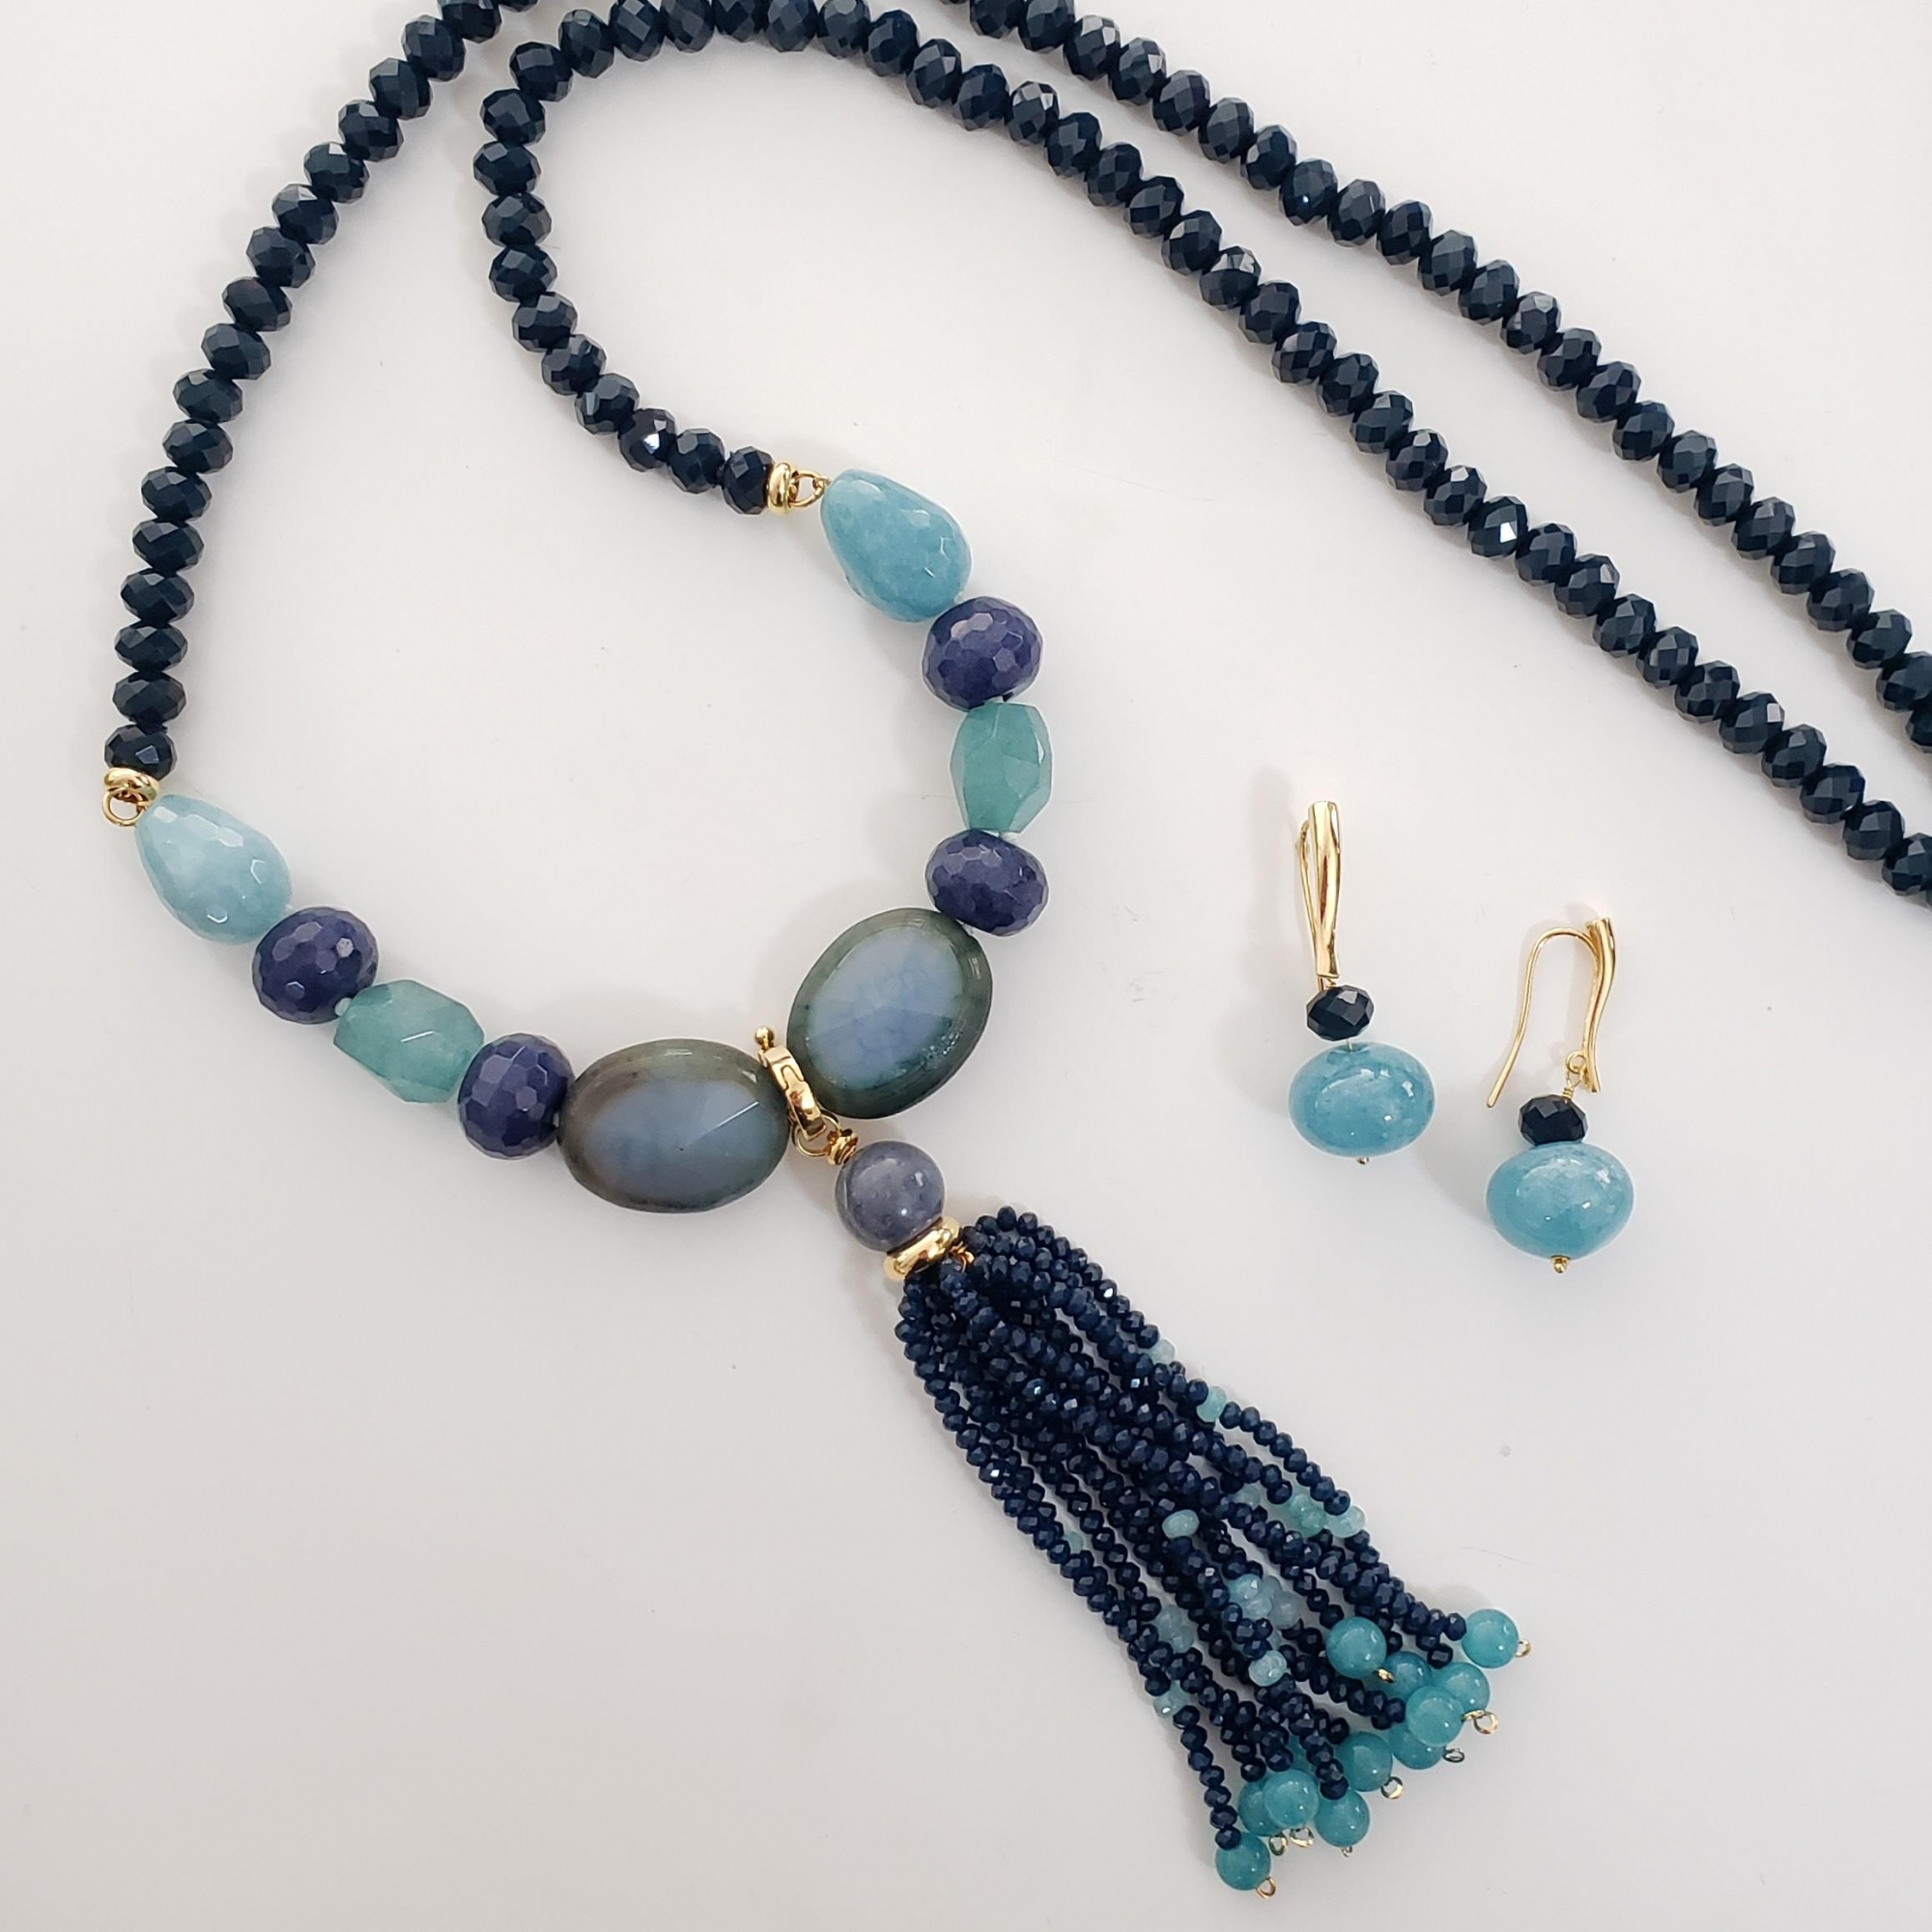 Colar Longo Cristal Azul Safira, Angelita, Agata Teal e Tassel Cristal Safira no Banho Ouro 18k Semijoia